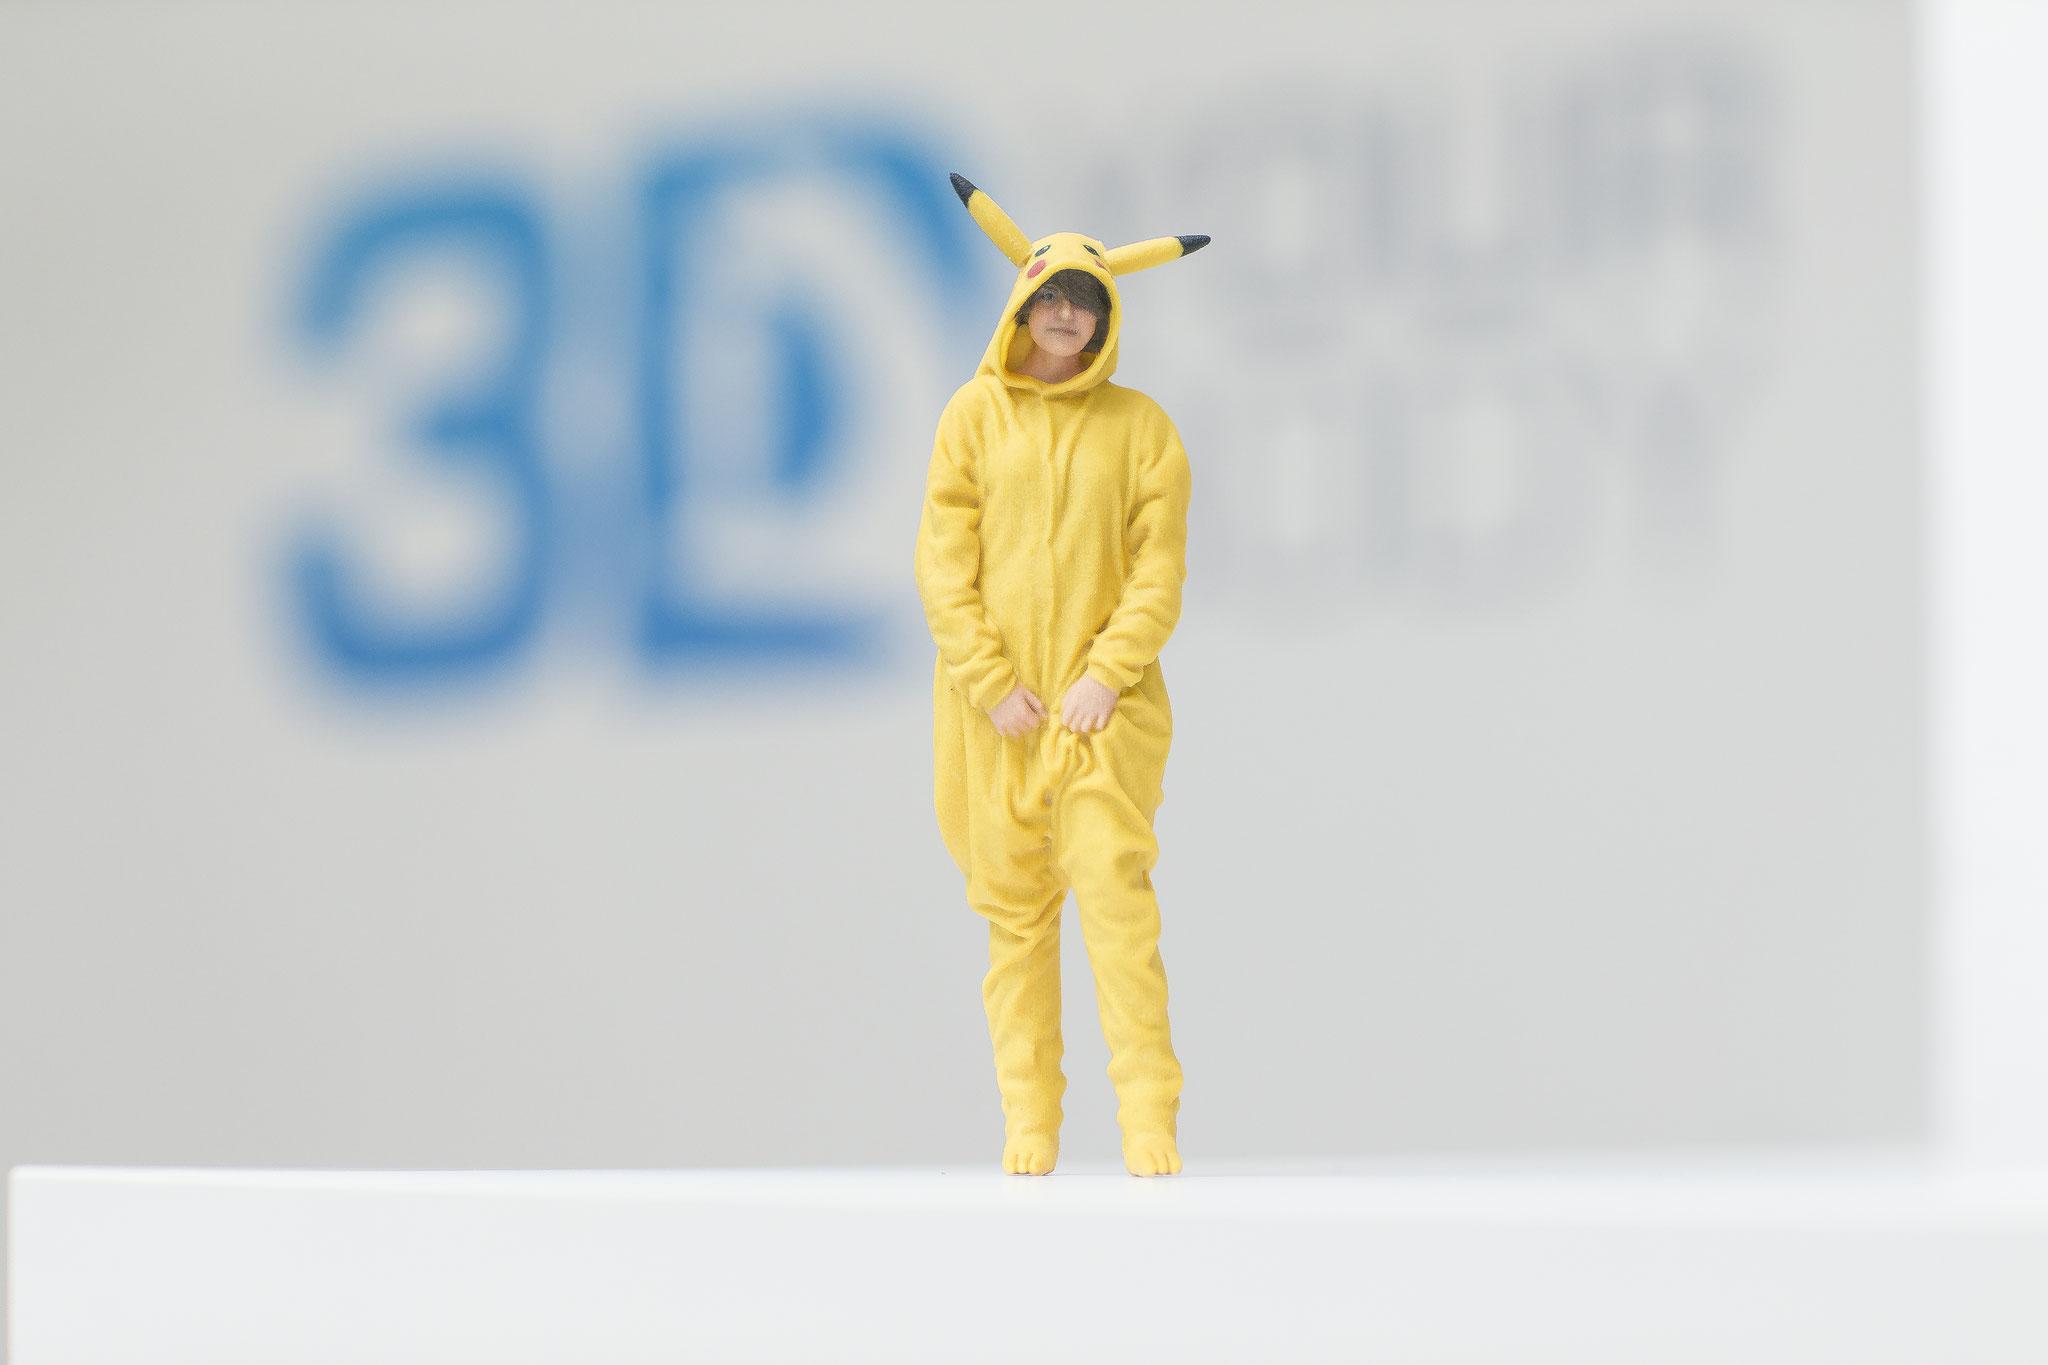 3D-Miniatur aus Berlin, München, Köln, Rostock und Dresden